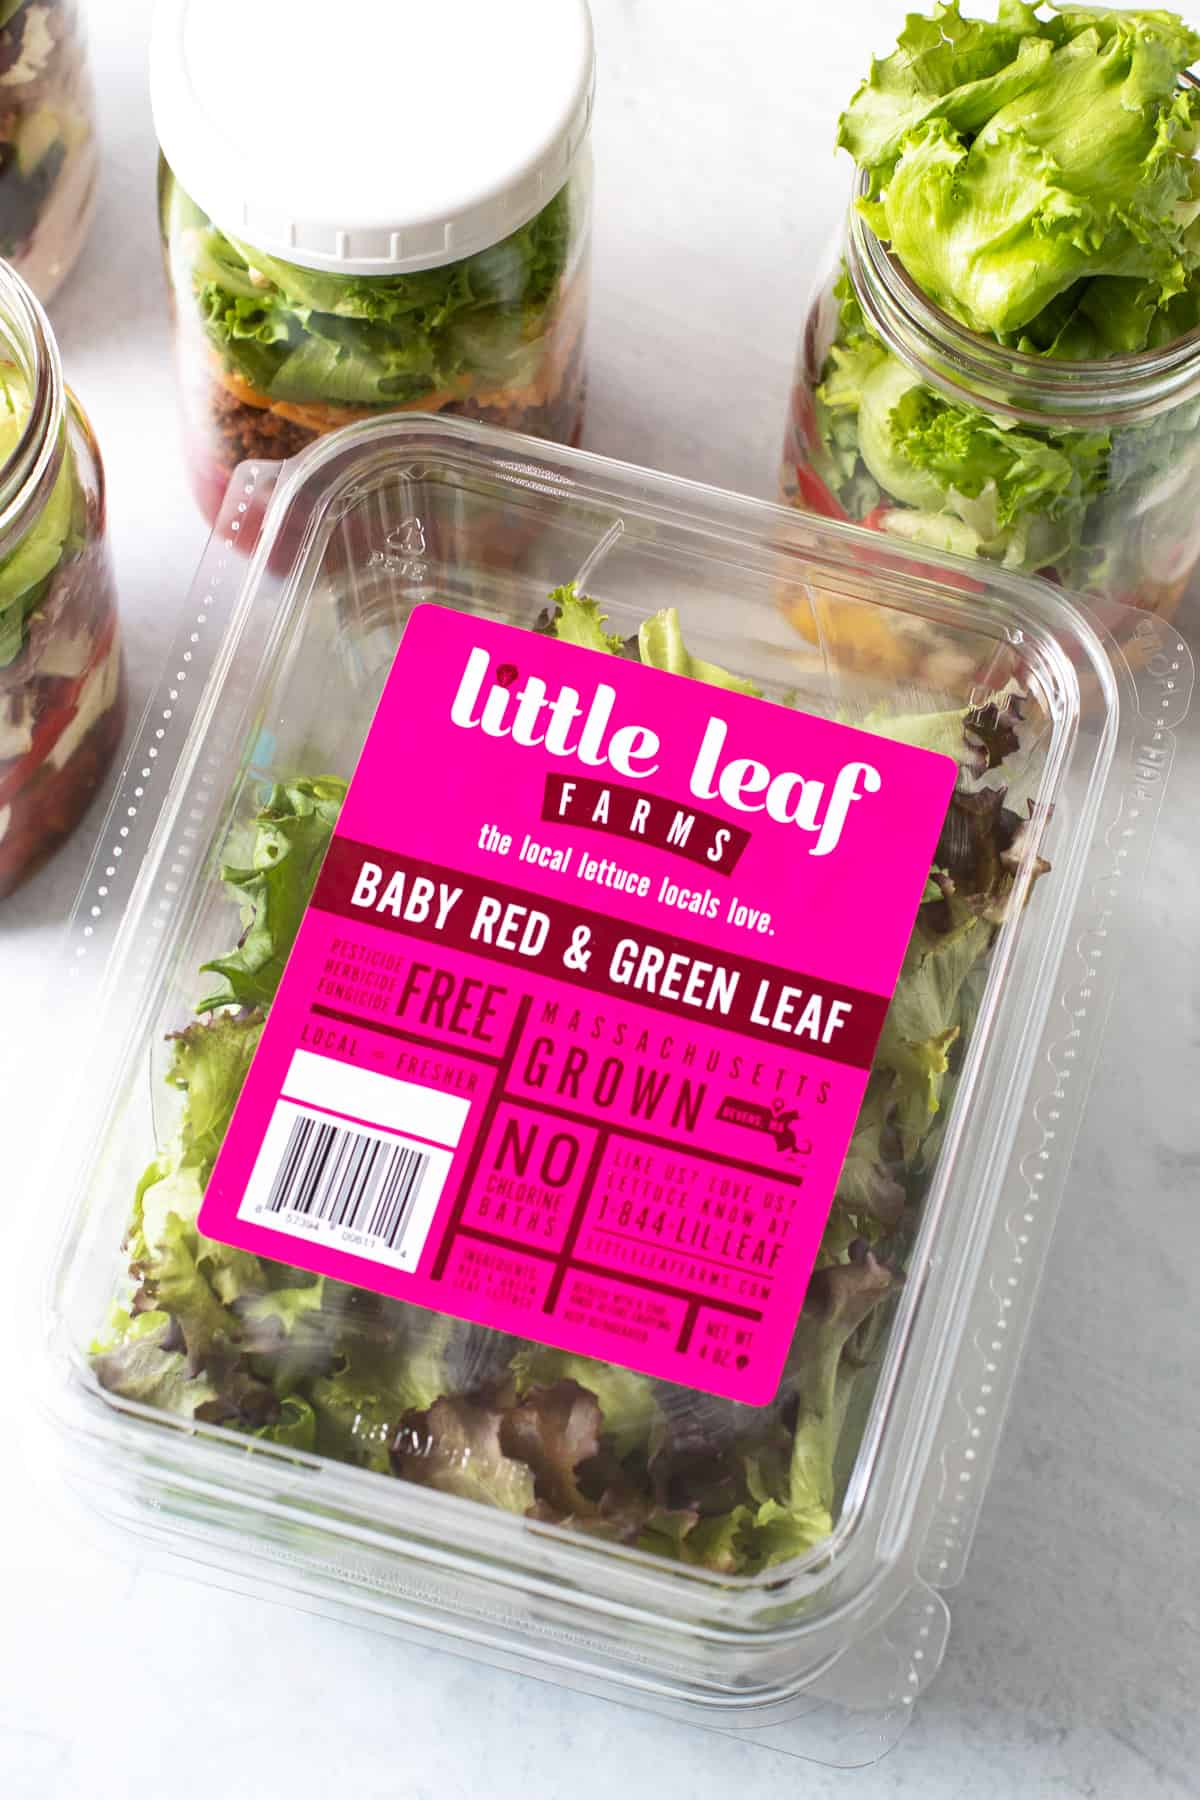 A box of lettuce.